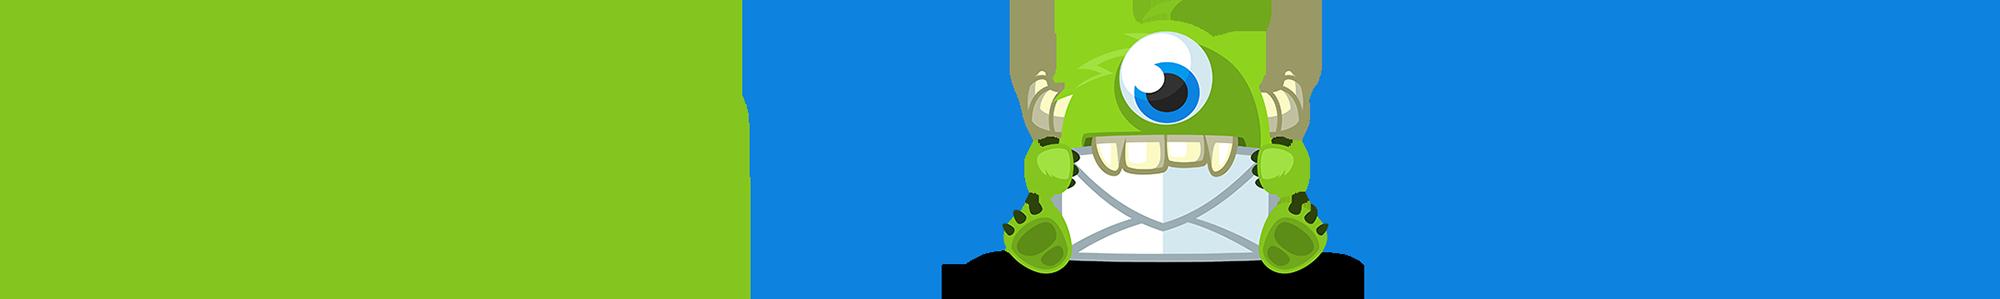 OptinMonster: Premium Lead Generation Tool for 35% Off